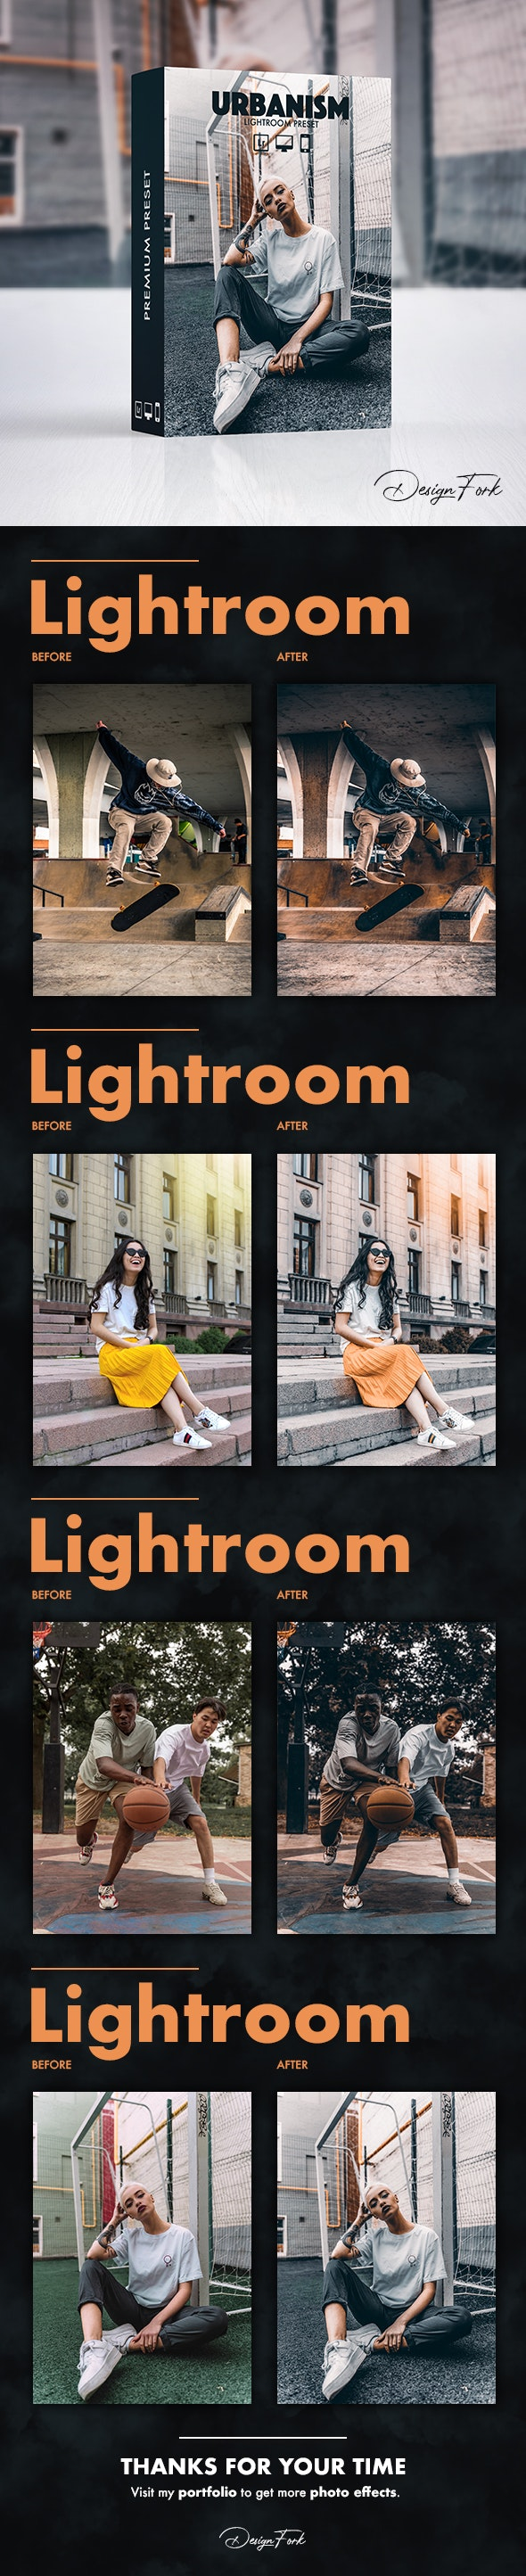 Urbanism FX Lightroom Preset - Cinematic Lightroom Presets